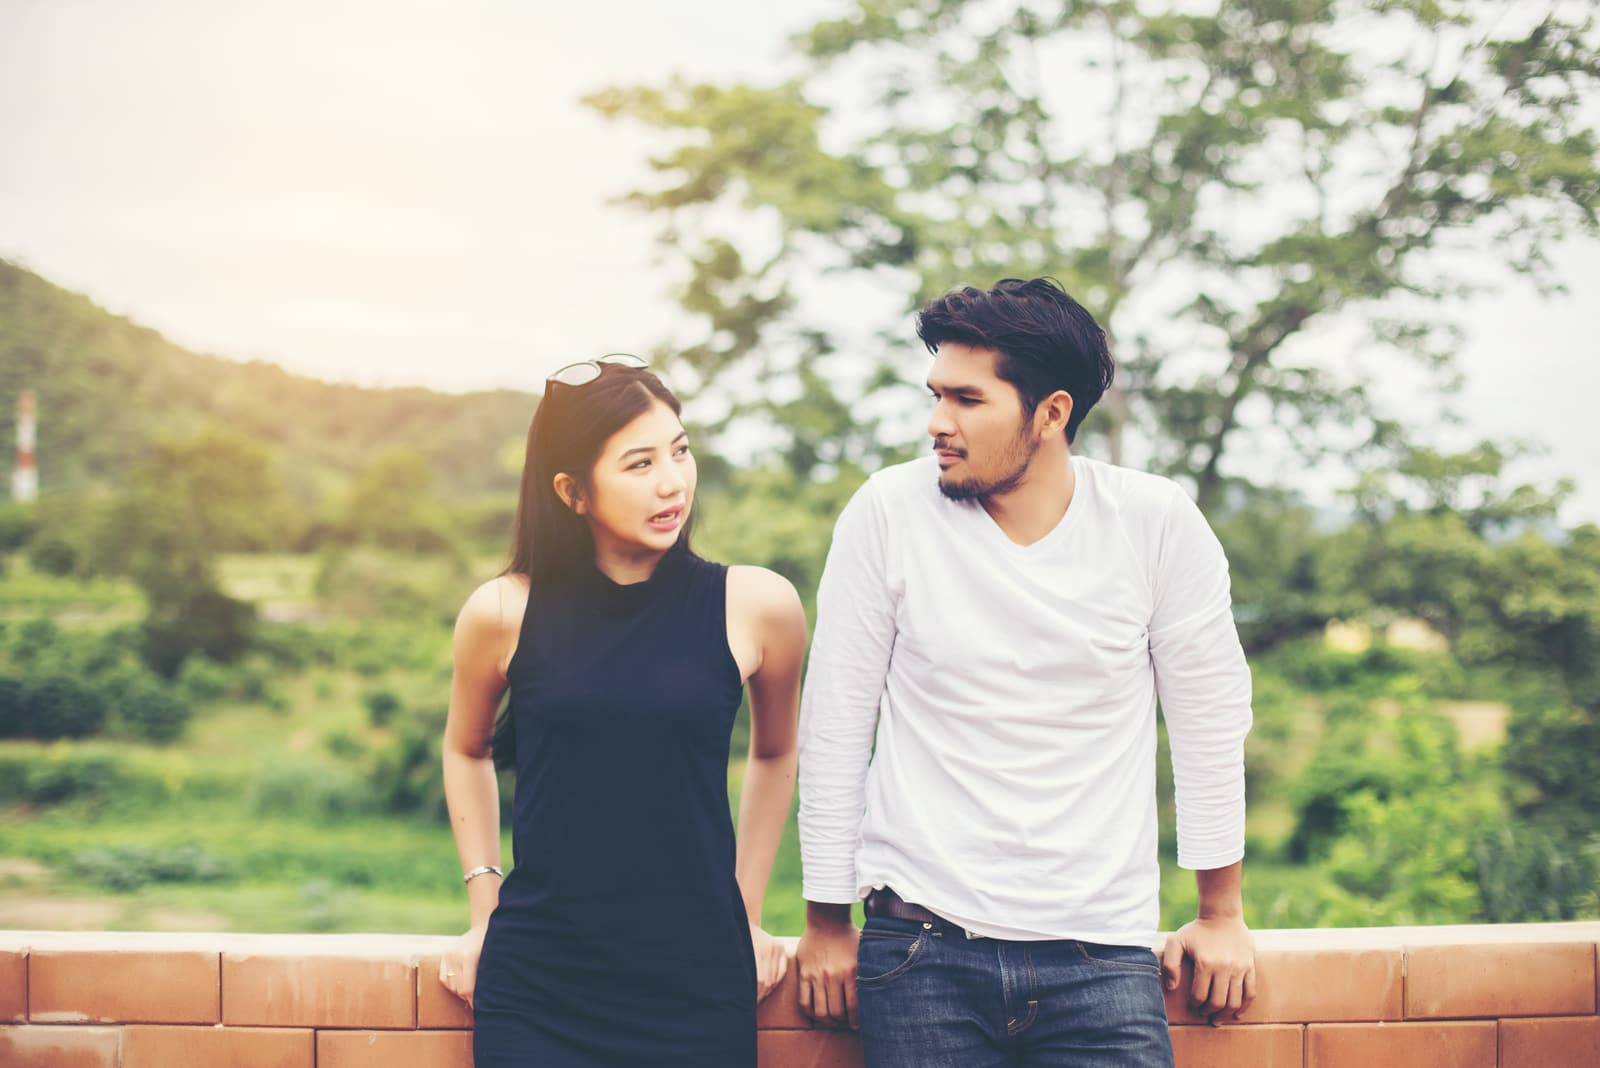 couple standing outdoor